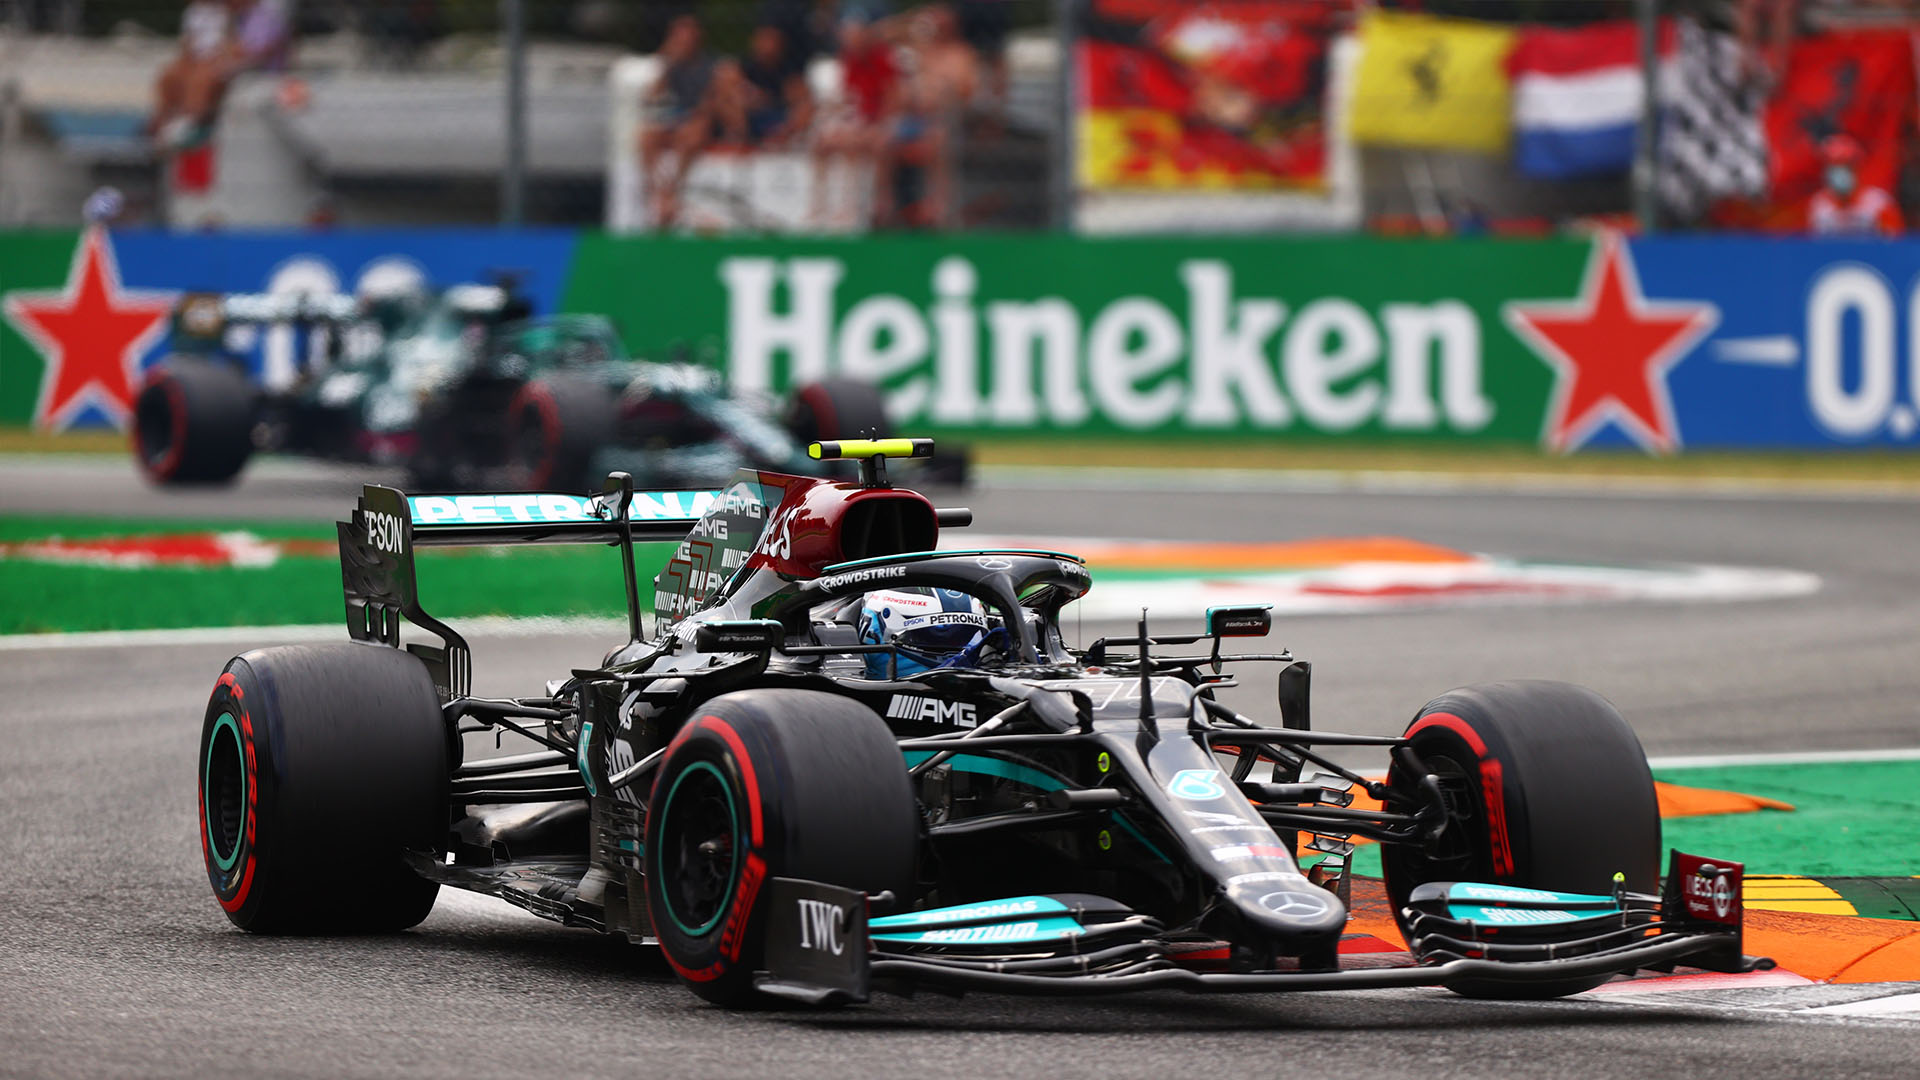 2021 Italian Grand Prix qualifying report & highlights: Bottas beats Hamilton at Monza to claim top grid slot for F1 Sprint   Formula 1®